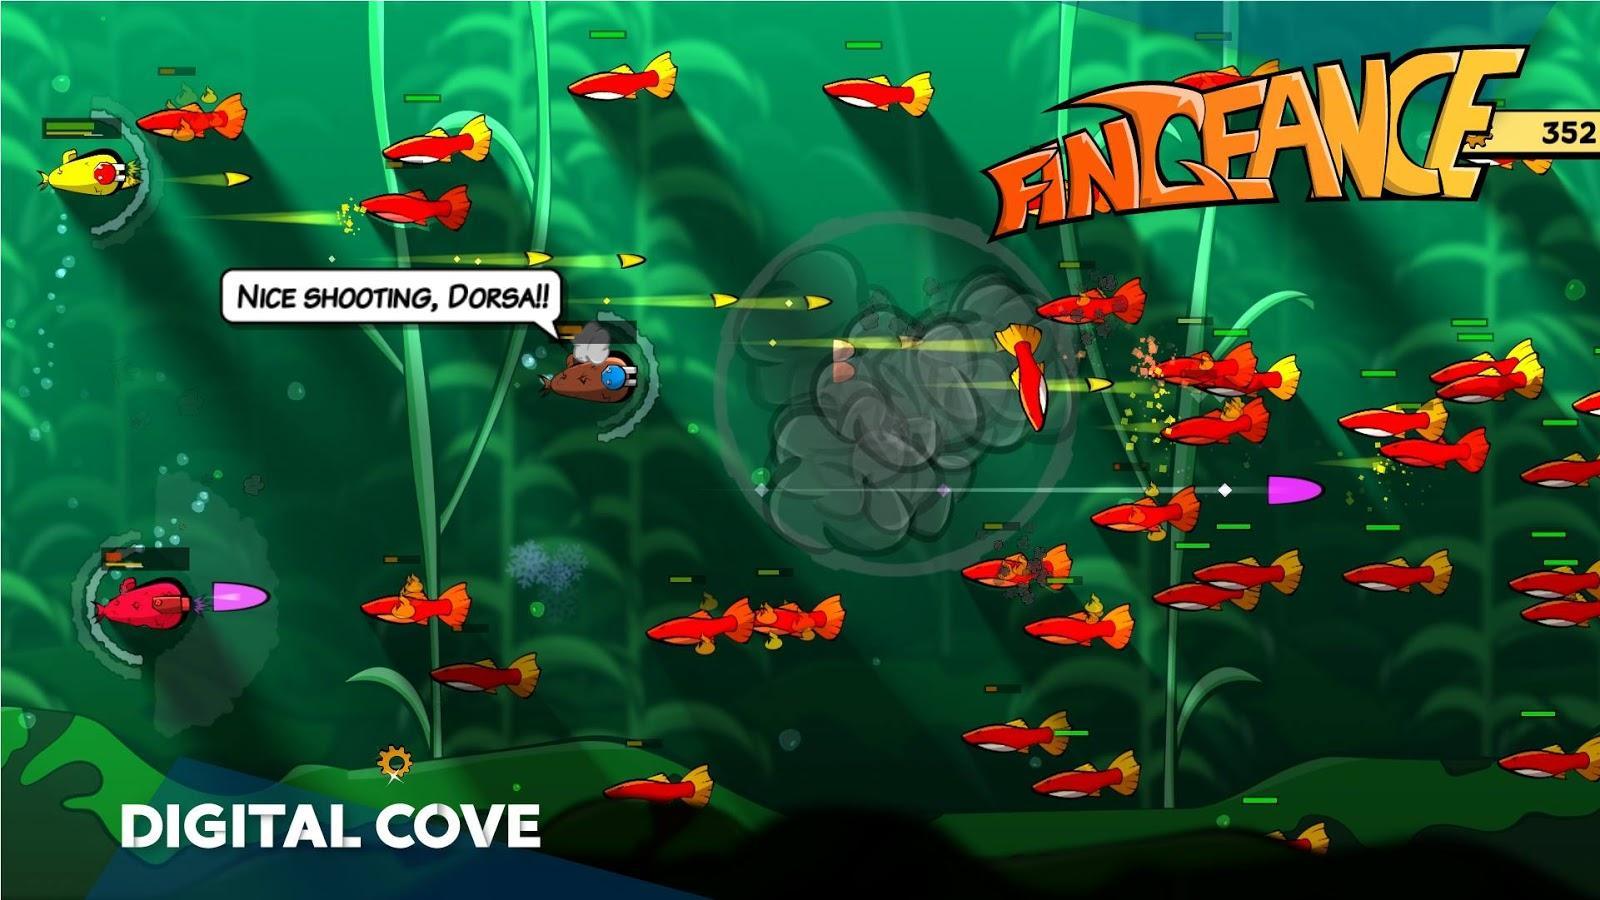 Screen shot of video game